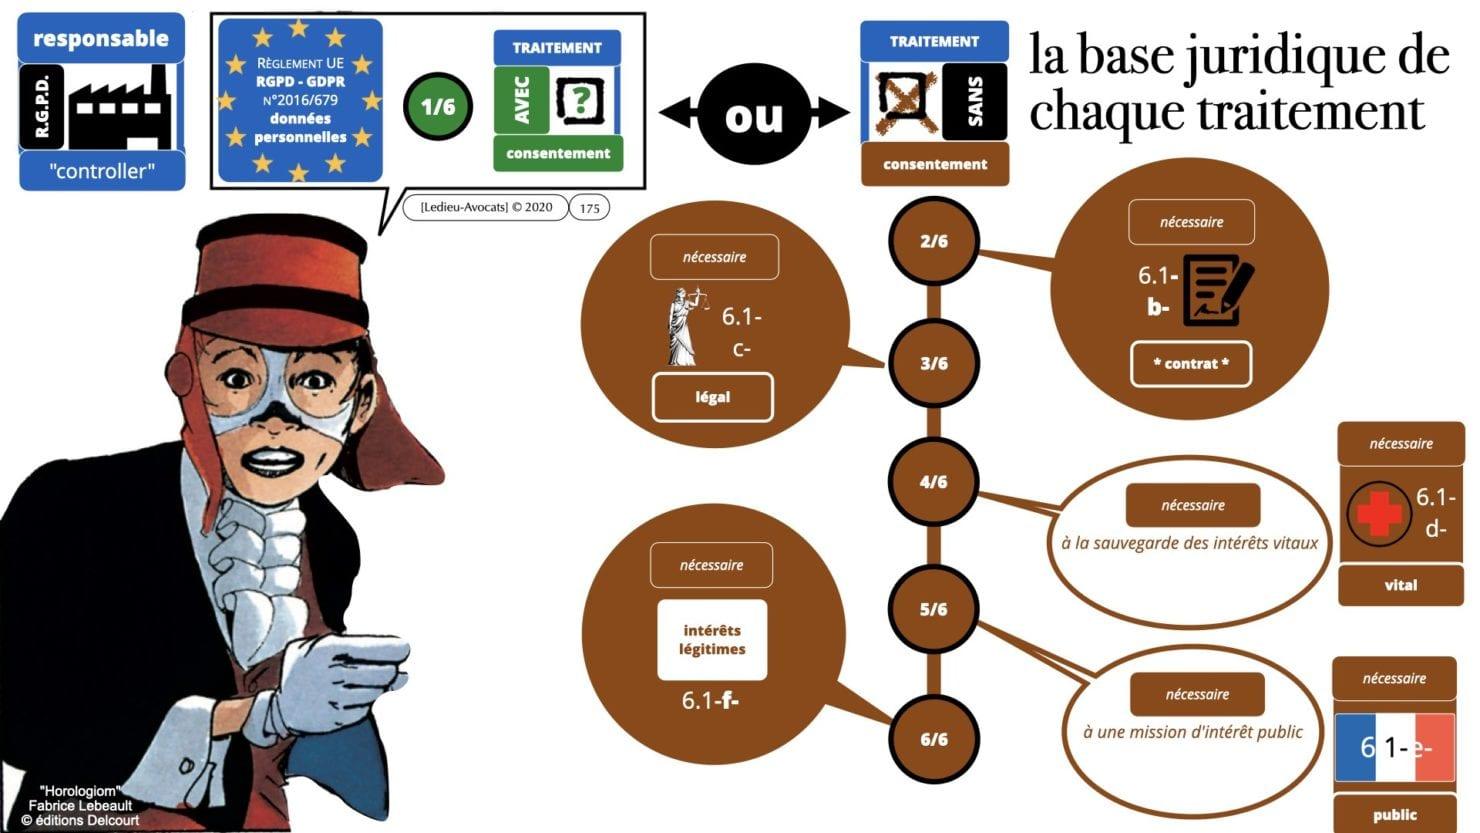 RGPD e-Privacy principes actualité jurisprudence ©Ledieu-Avocats 25-06-2021.175